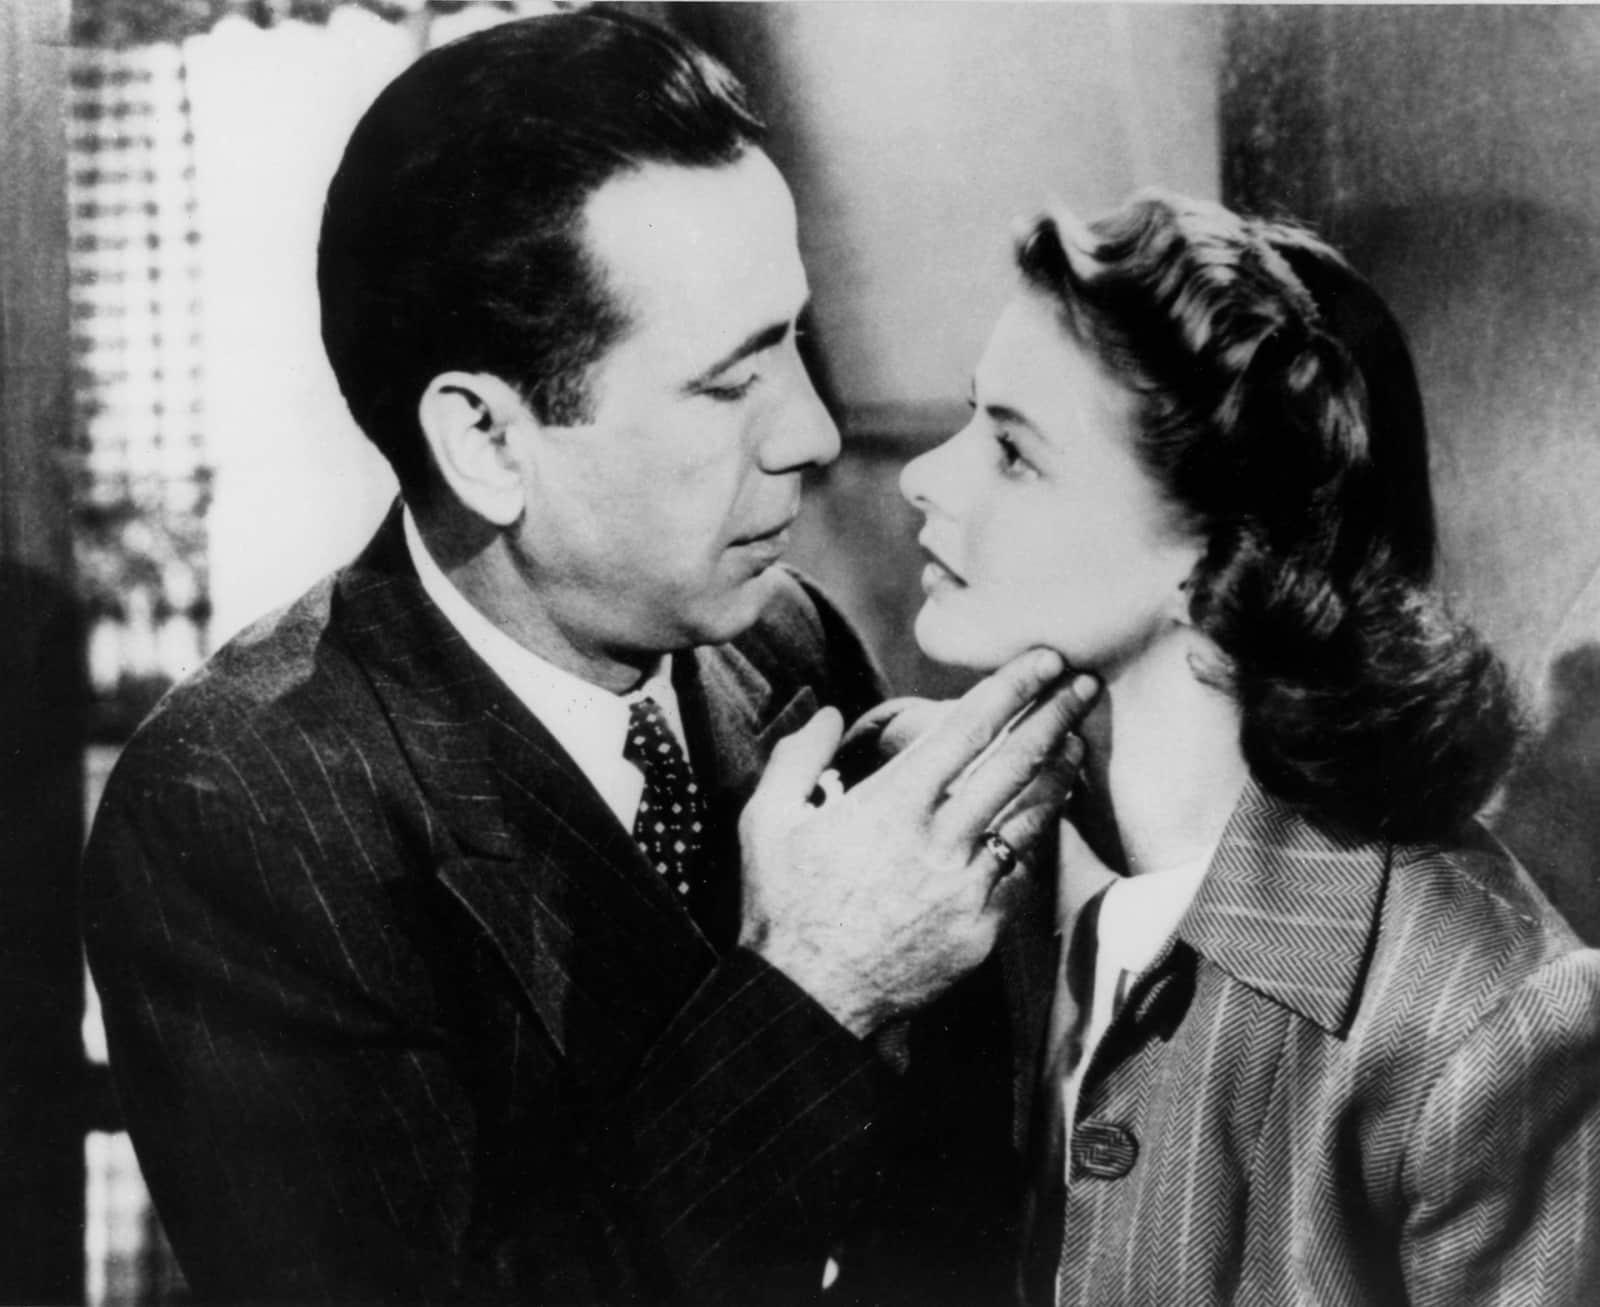 Das alte Hollywood: Ikonen der Goldenen Ära – Part 1